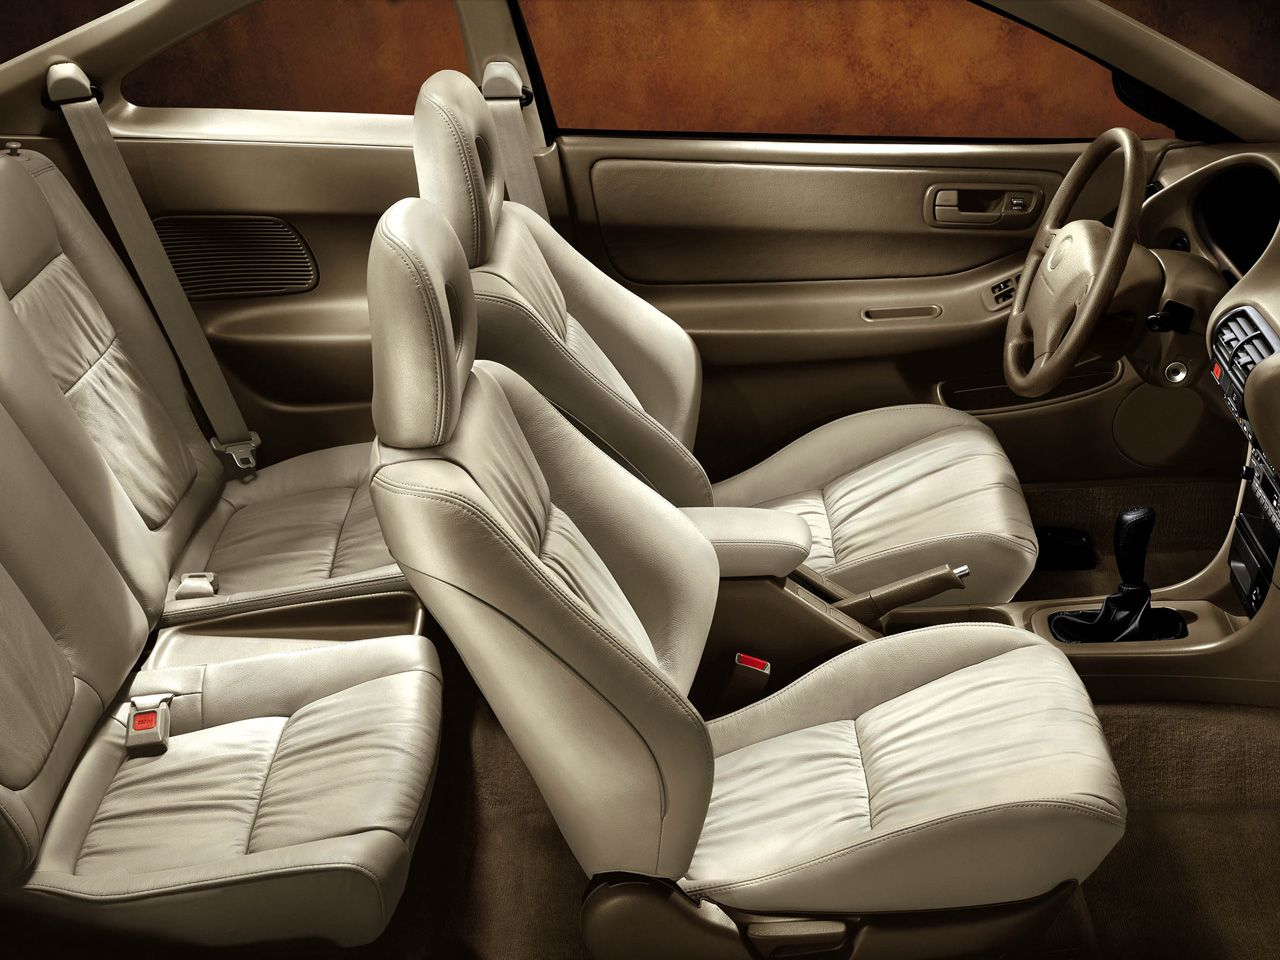 acura integra interior mods. 1998 acura integra i wanna make my interior look new mods